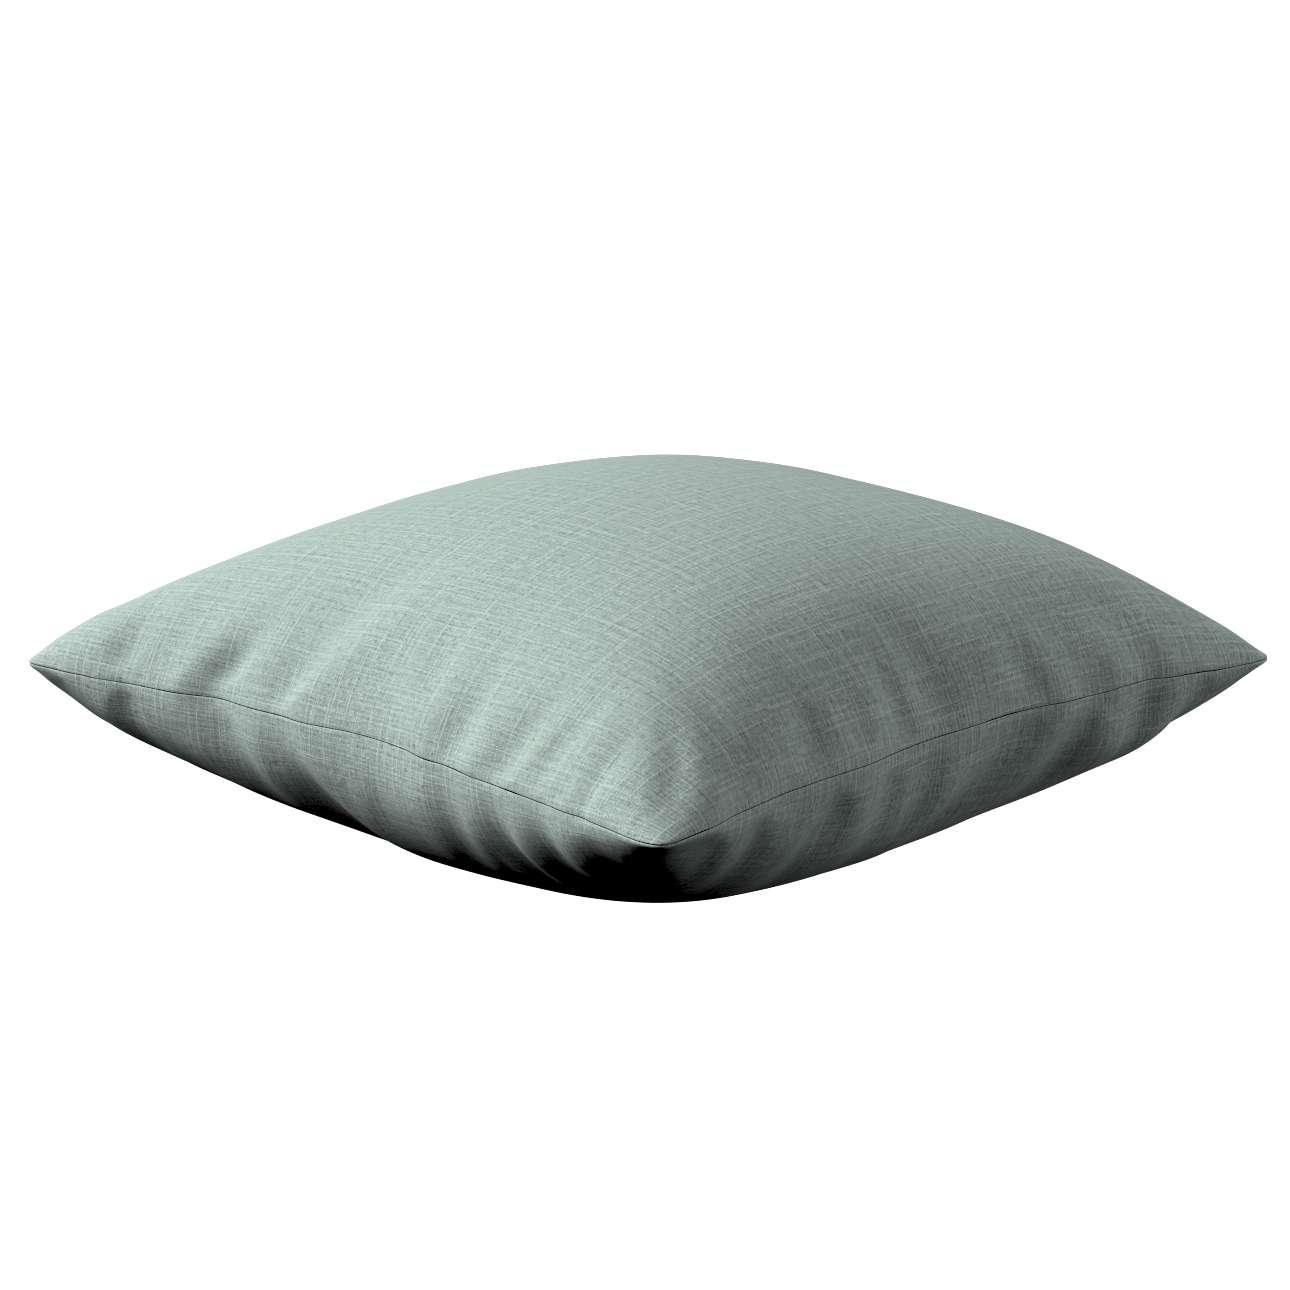 Kinga - potah na polštář jednoduchý v kolekci Living II, látka: 160-86